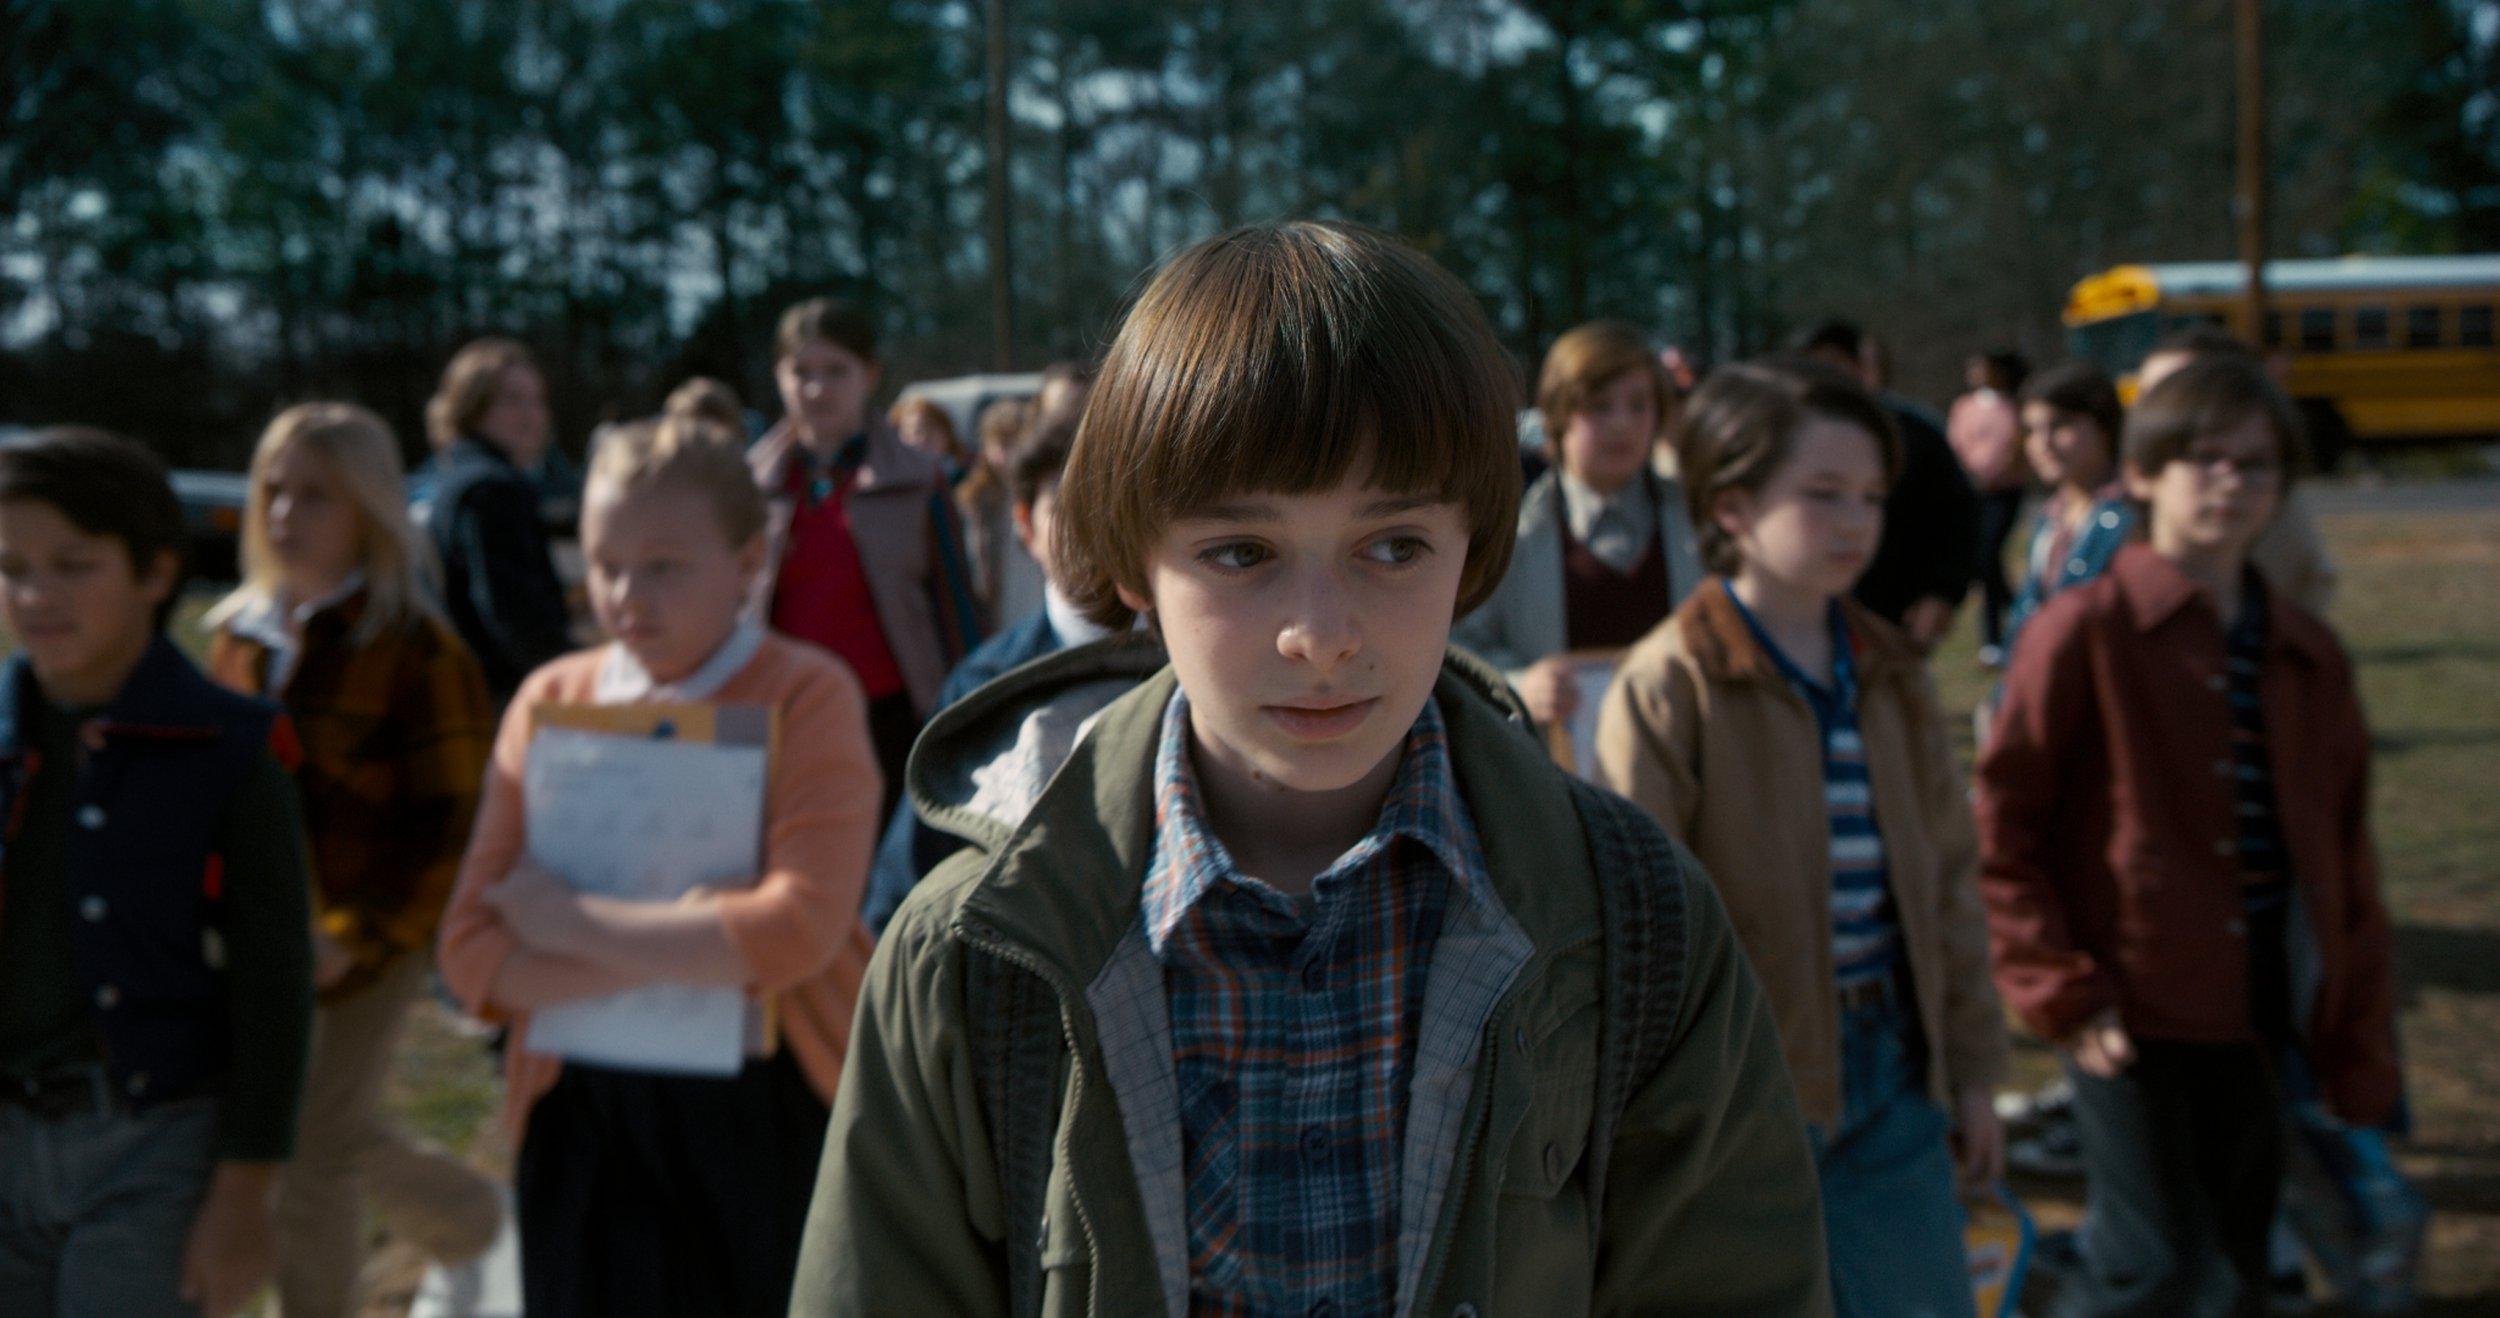 When is Stranger Things season three released on Netflix?